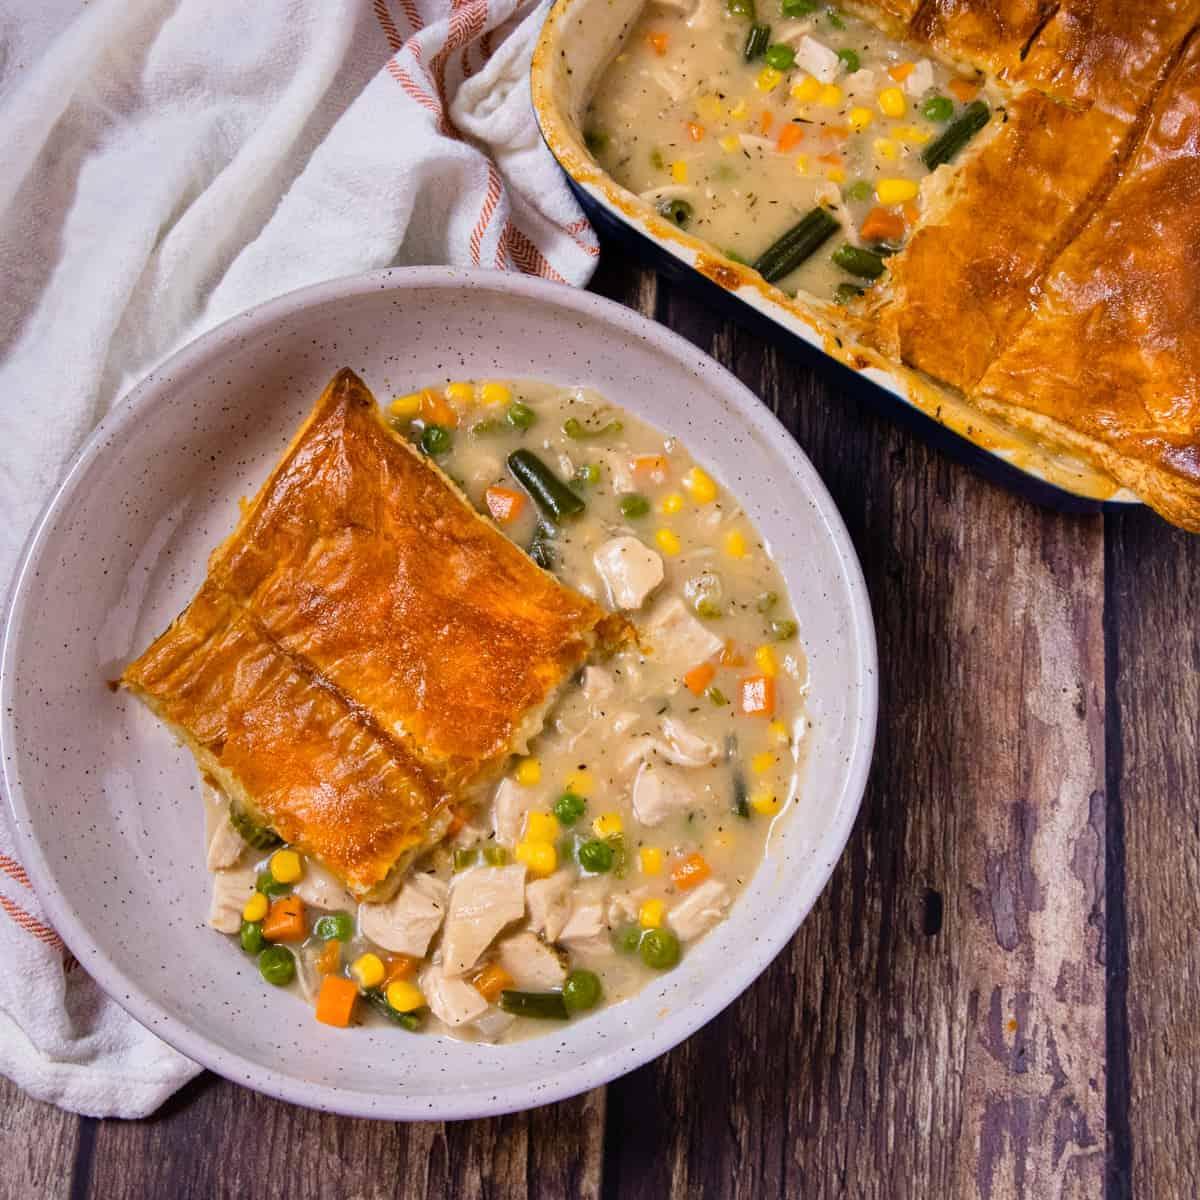 Overhead view of a plate of turkey pot pie set beside a baking dish of pot pie.